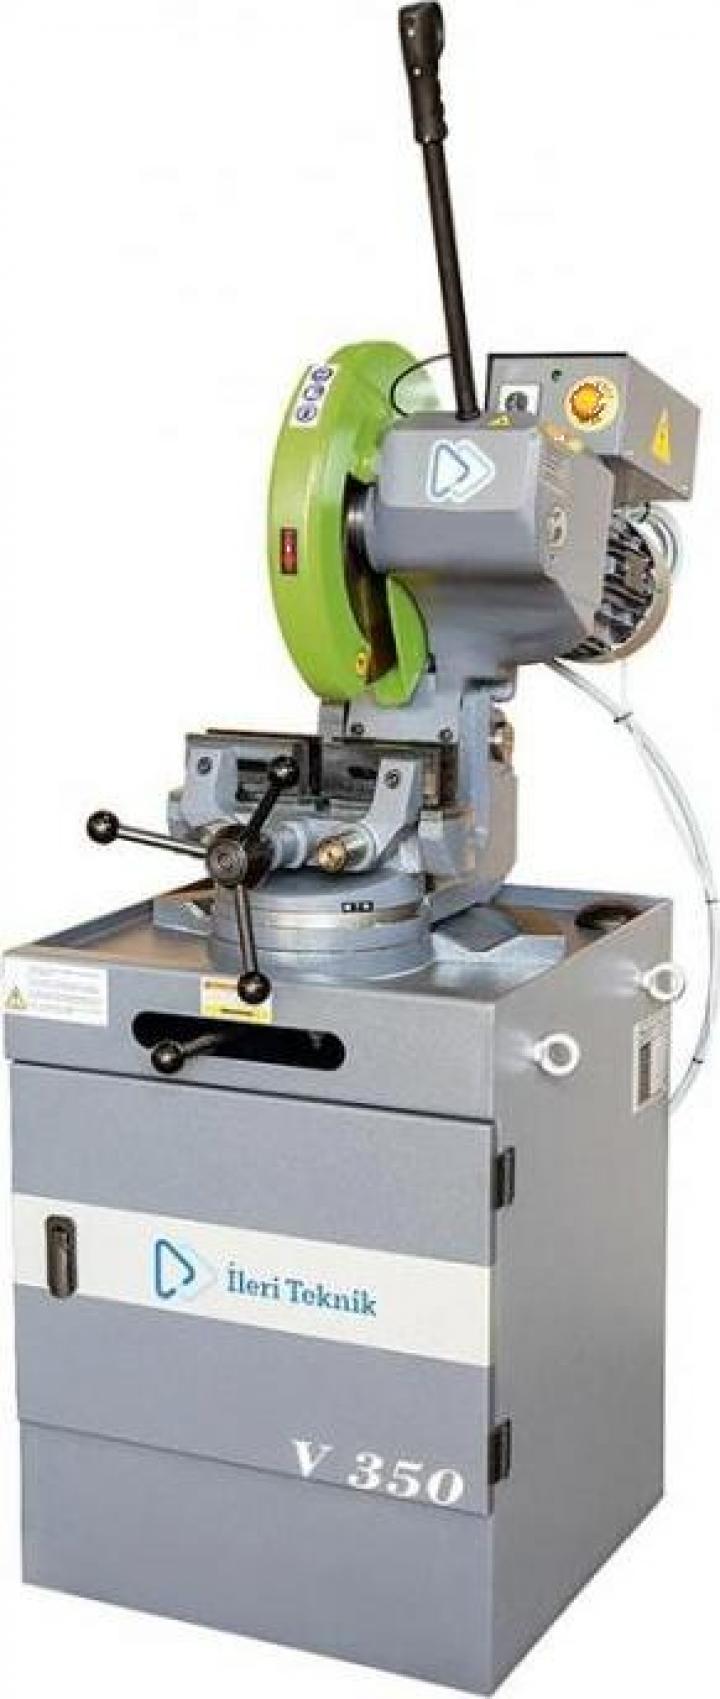 Fierastrau circular manual cu menghina automata V 350 T